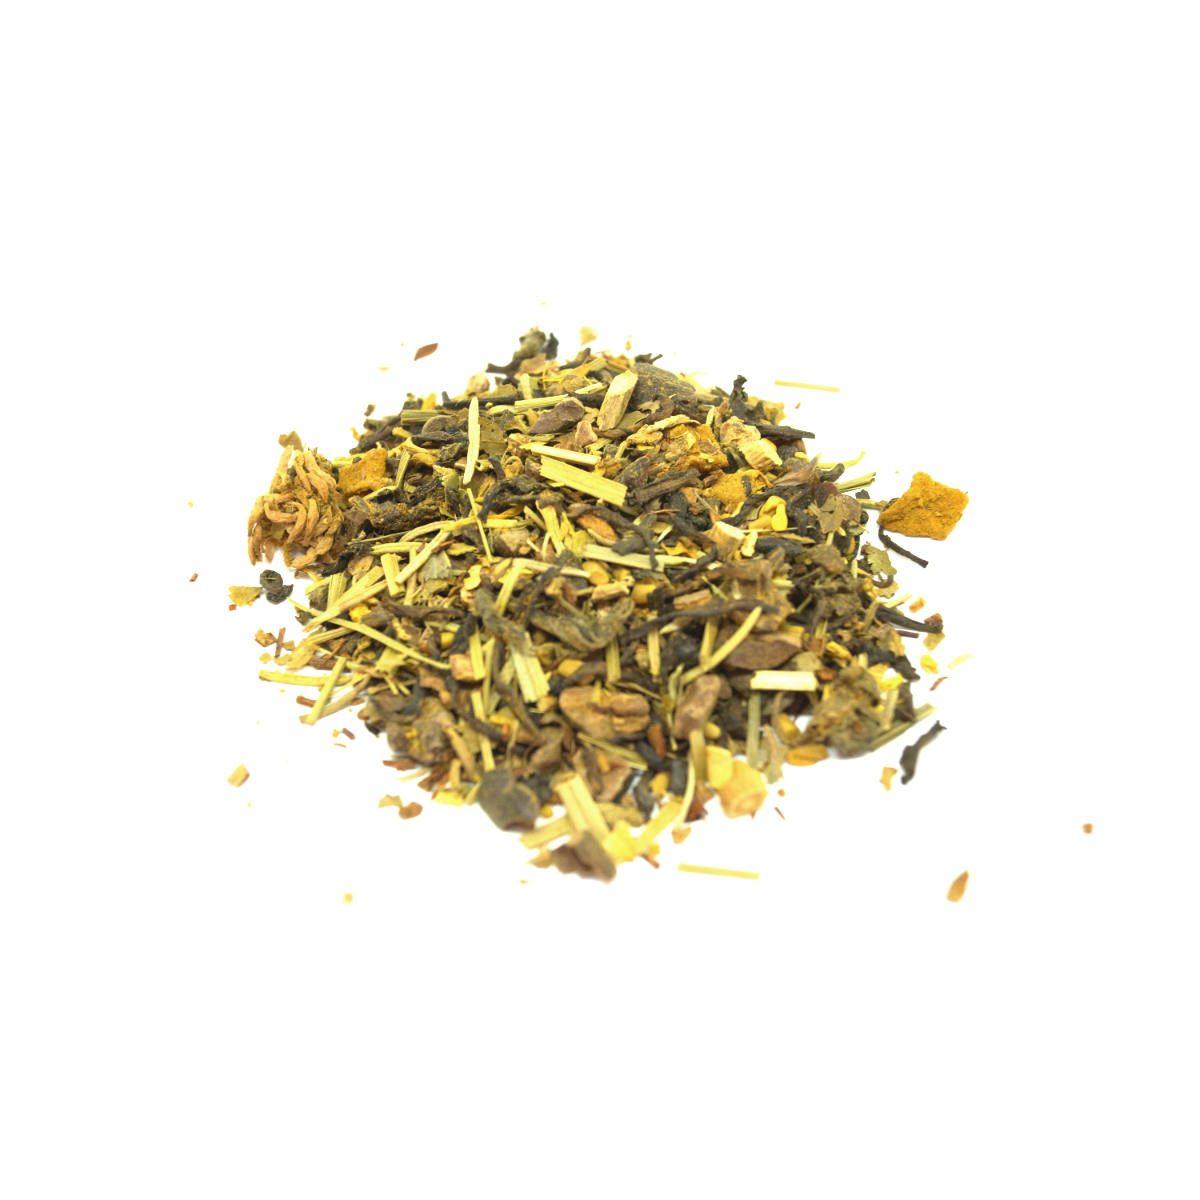 Chinese Sencha Green Tea with Freeze Dried Strawberry and Mango, Marshmallow Root, Couch Grass, Sarsaparilla, Dandelion Root, Wakame Flakes and Uva Ursi